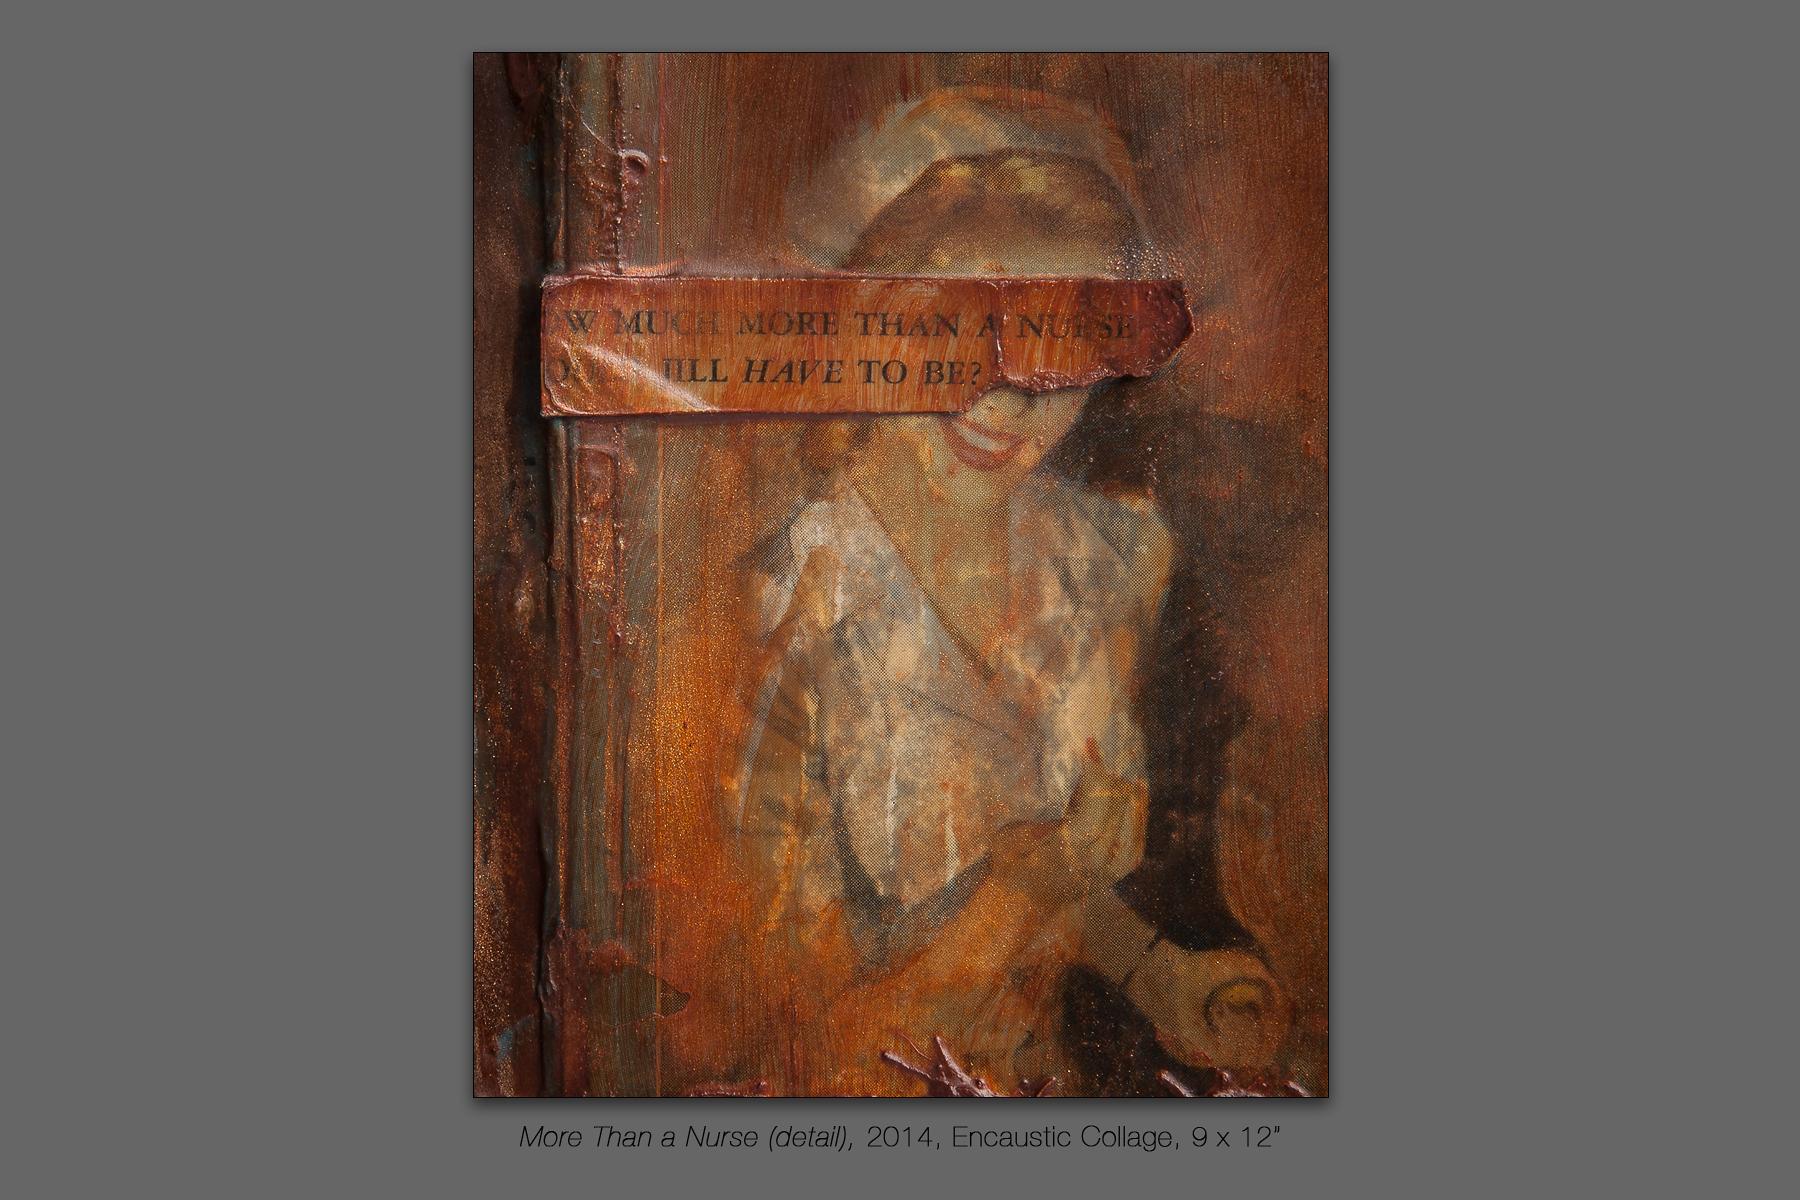 More Than a Nurse (detail), 2014